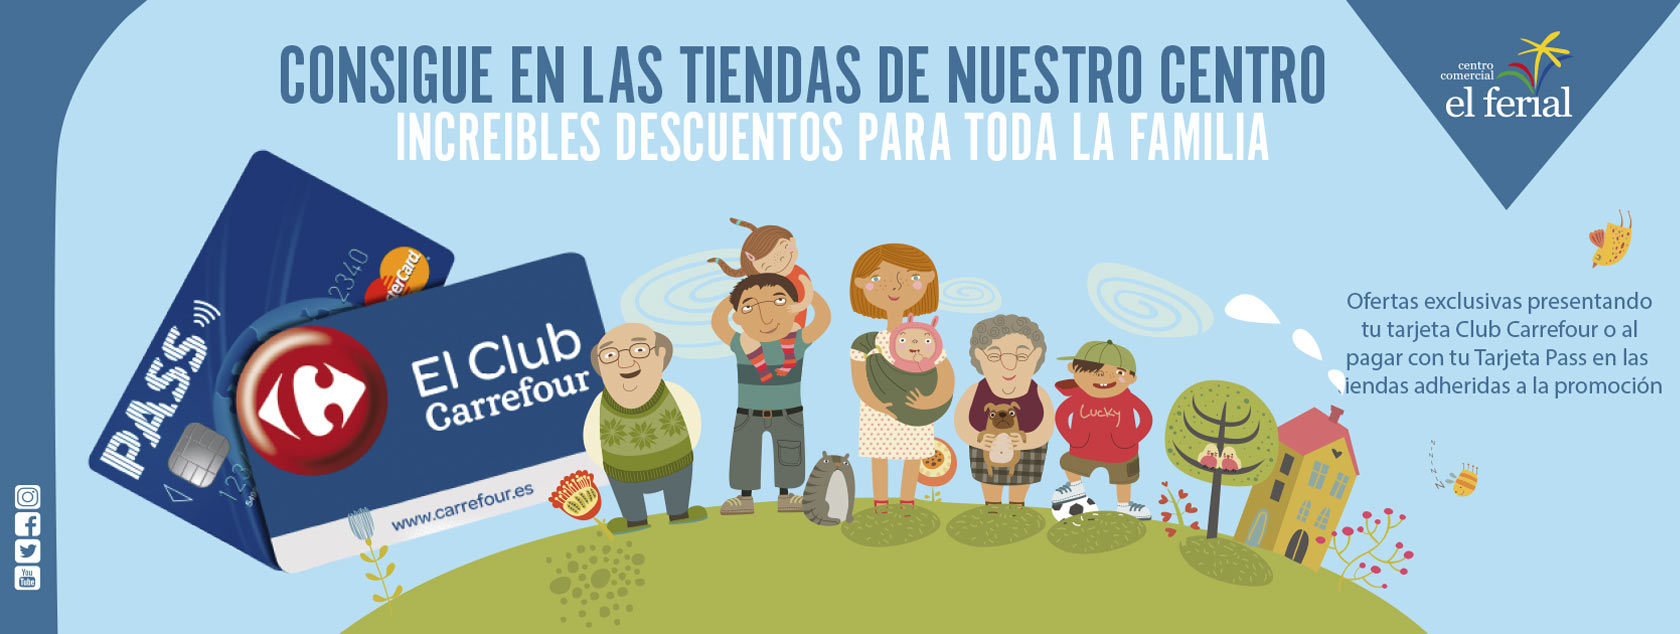 Ofertas exclusivas con tu tarjeta Club Carrefour o PASS